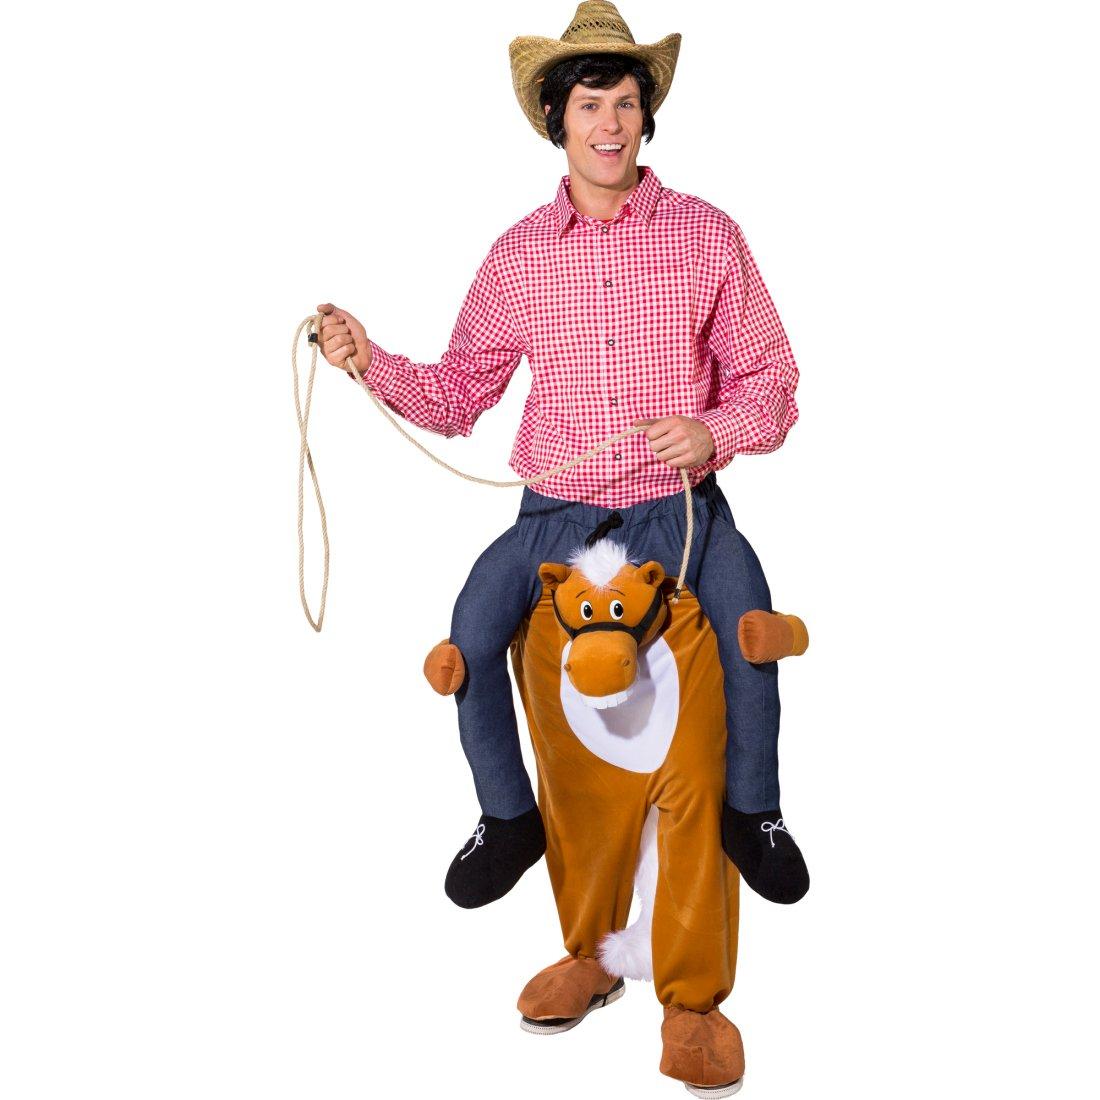 conveniente Traje Llévame Caballo - 1,80-1,95m   Disfraz Montando en en en Caballo   Traje Montable Póney   Disfraz Animal a Hombros  costo real